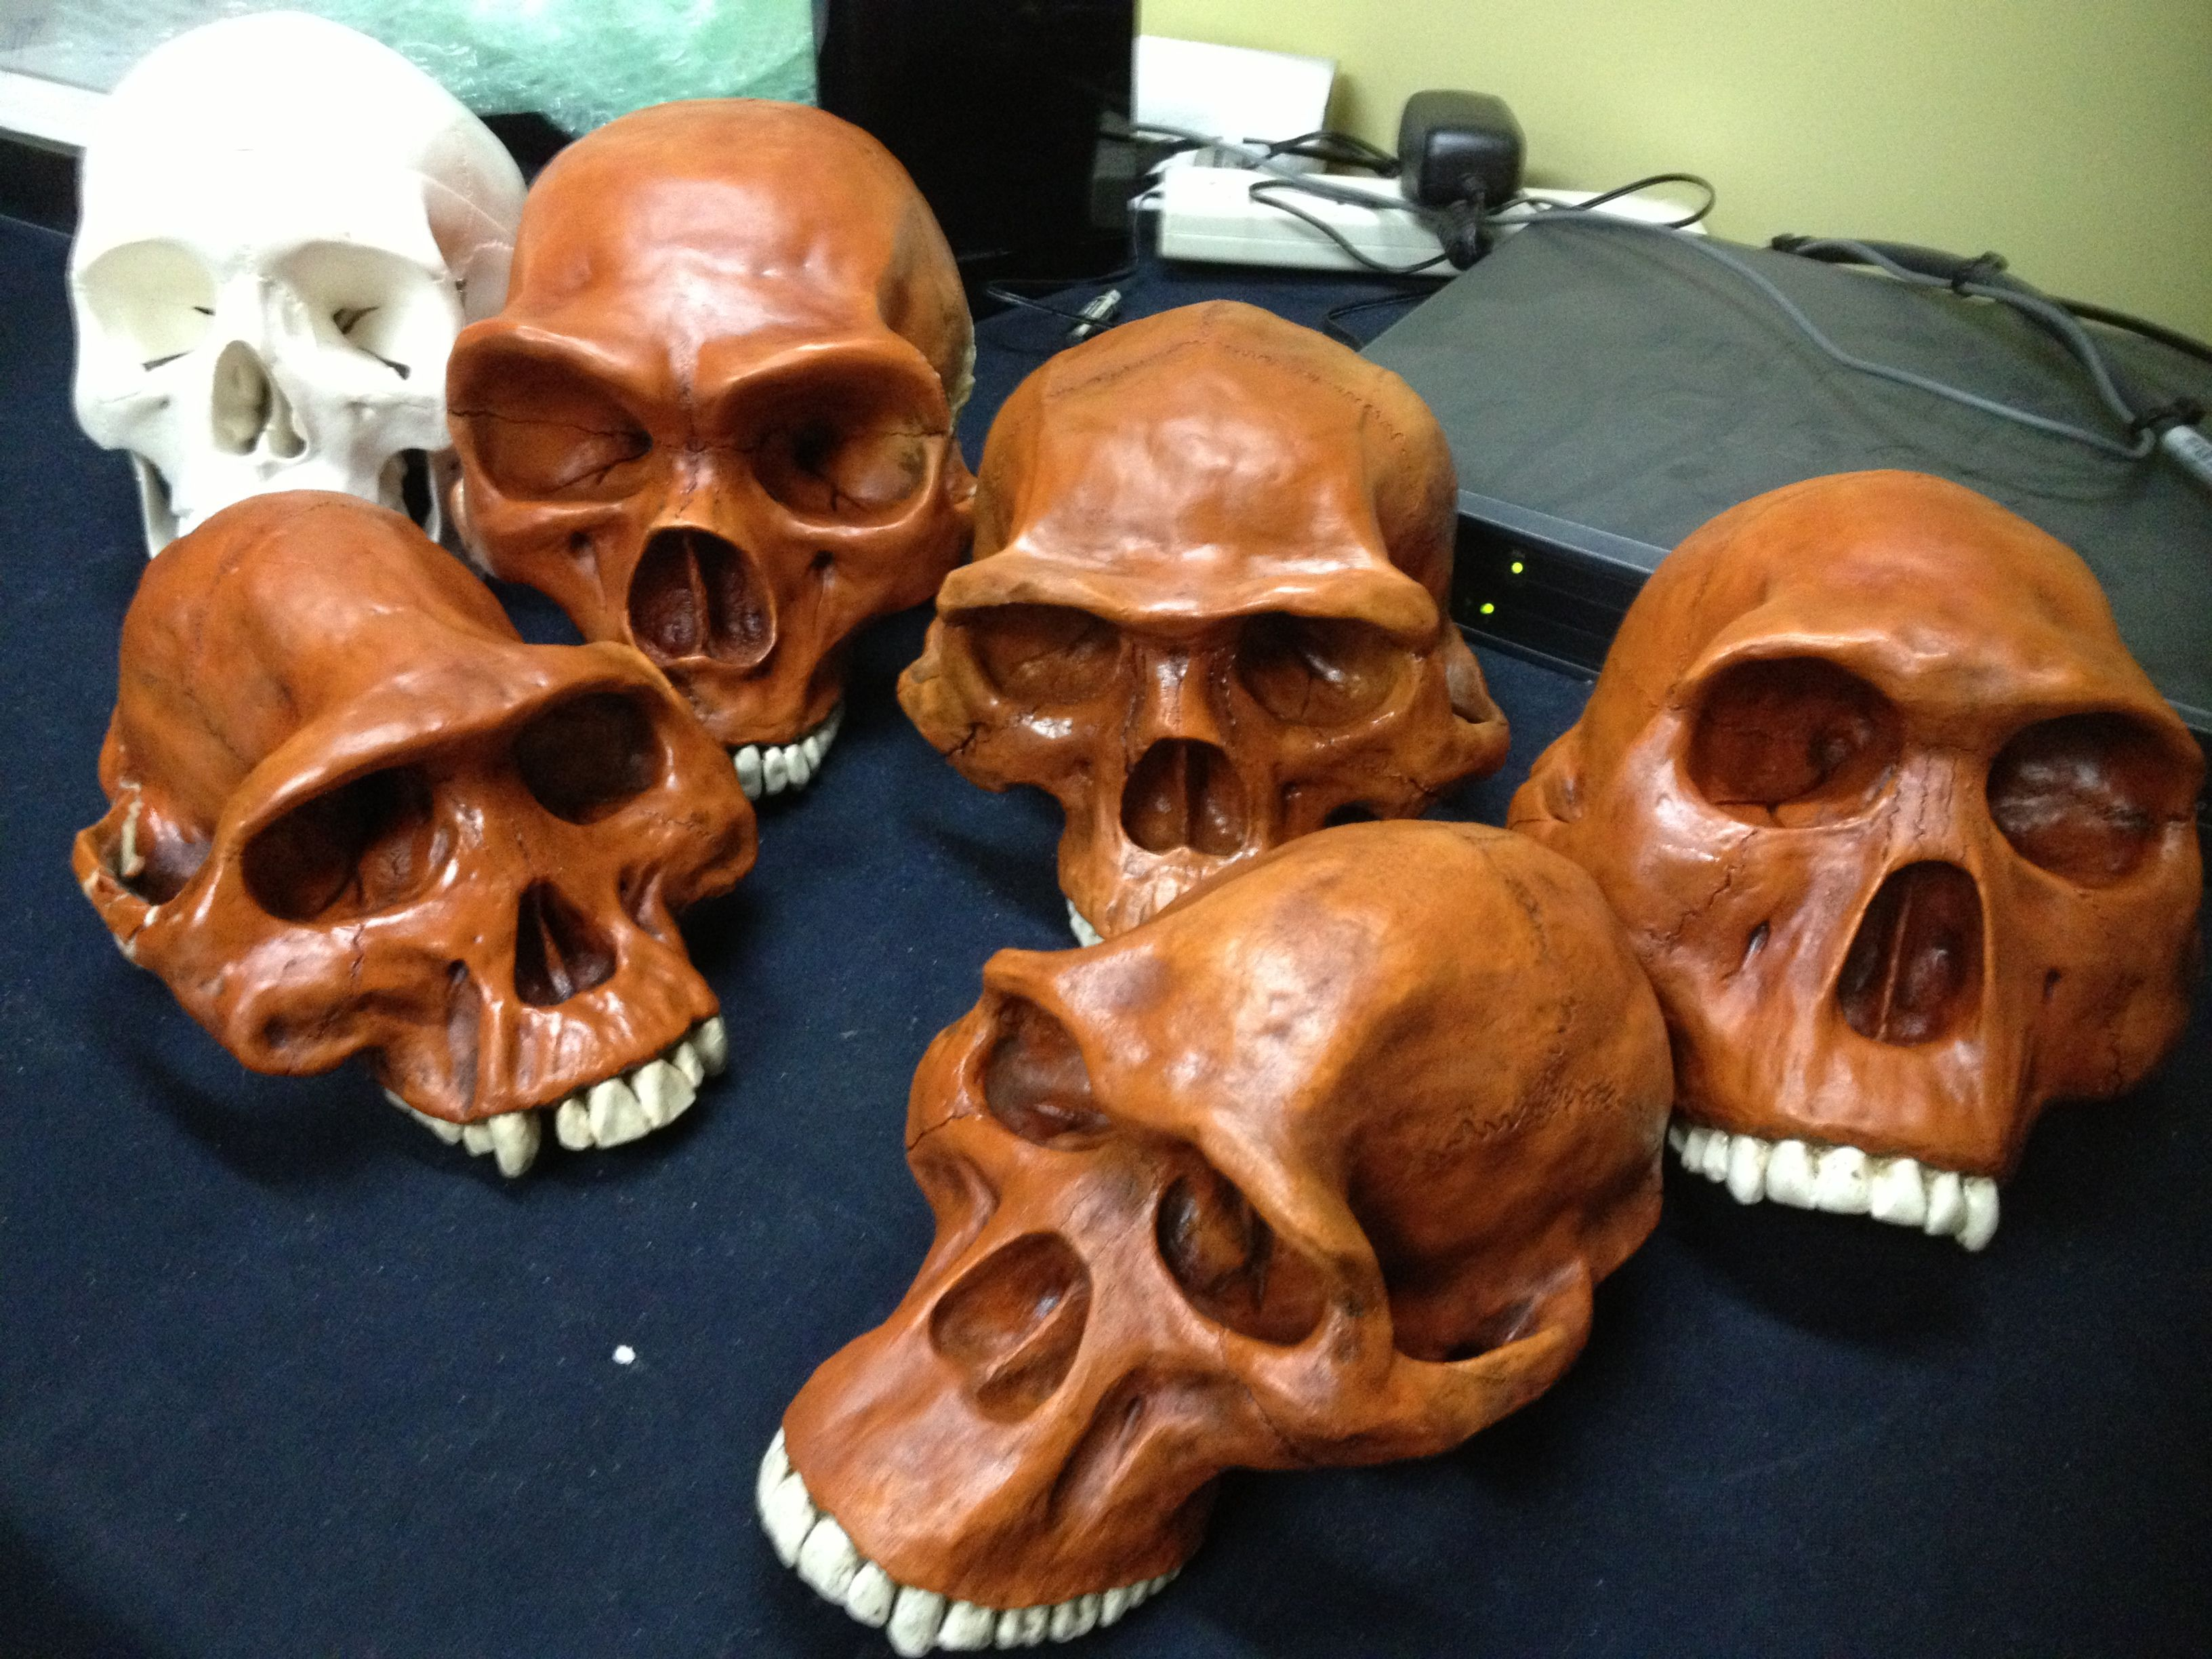 Early Hominid Skulls Teaching Human Pre History Via Video